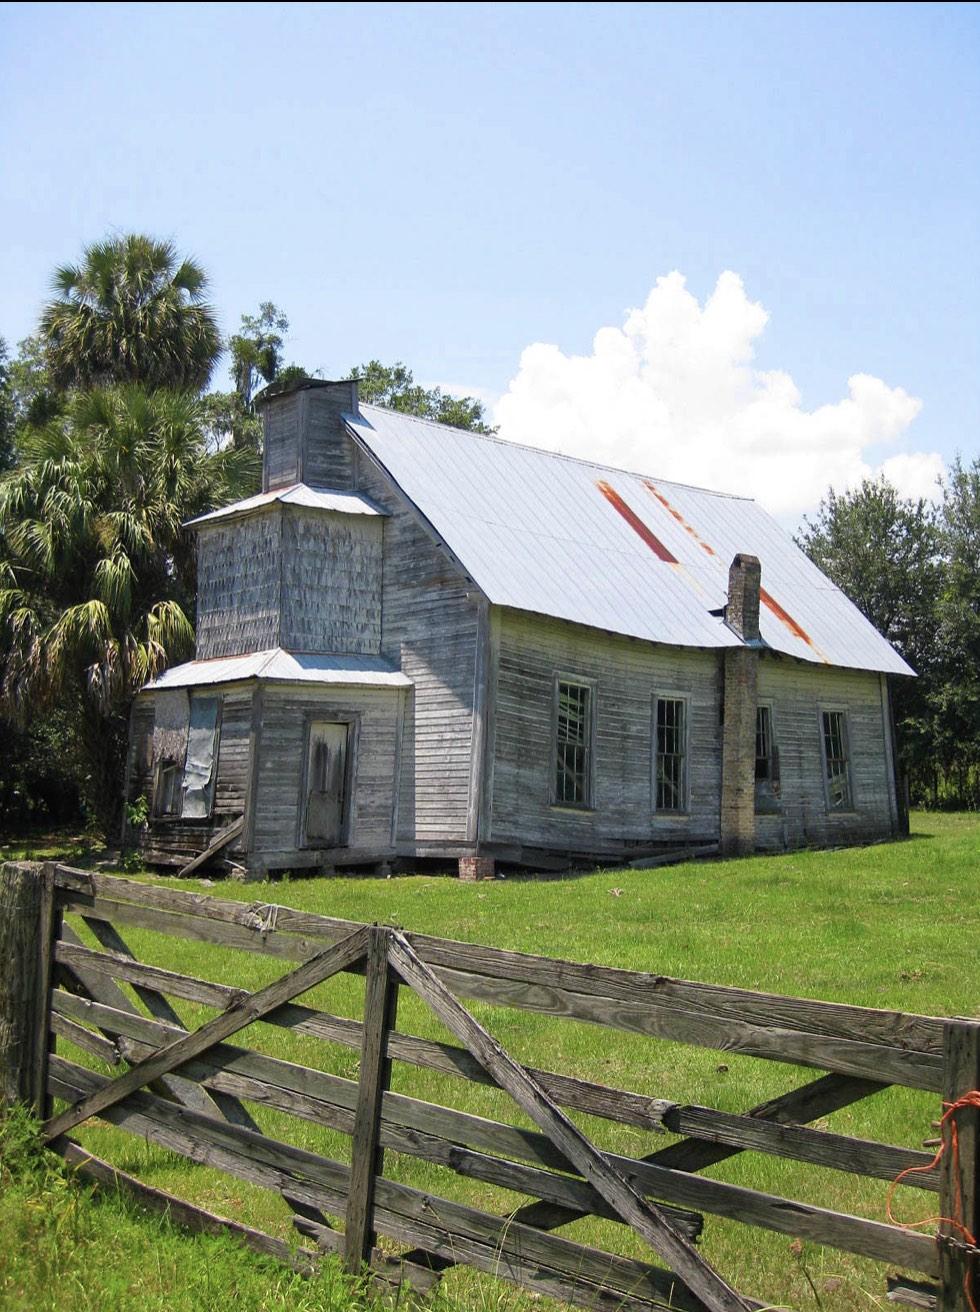 Church in Island Grove, Florida